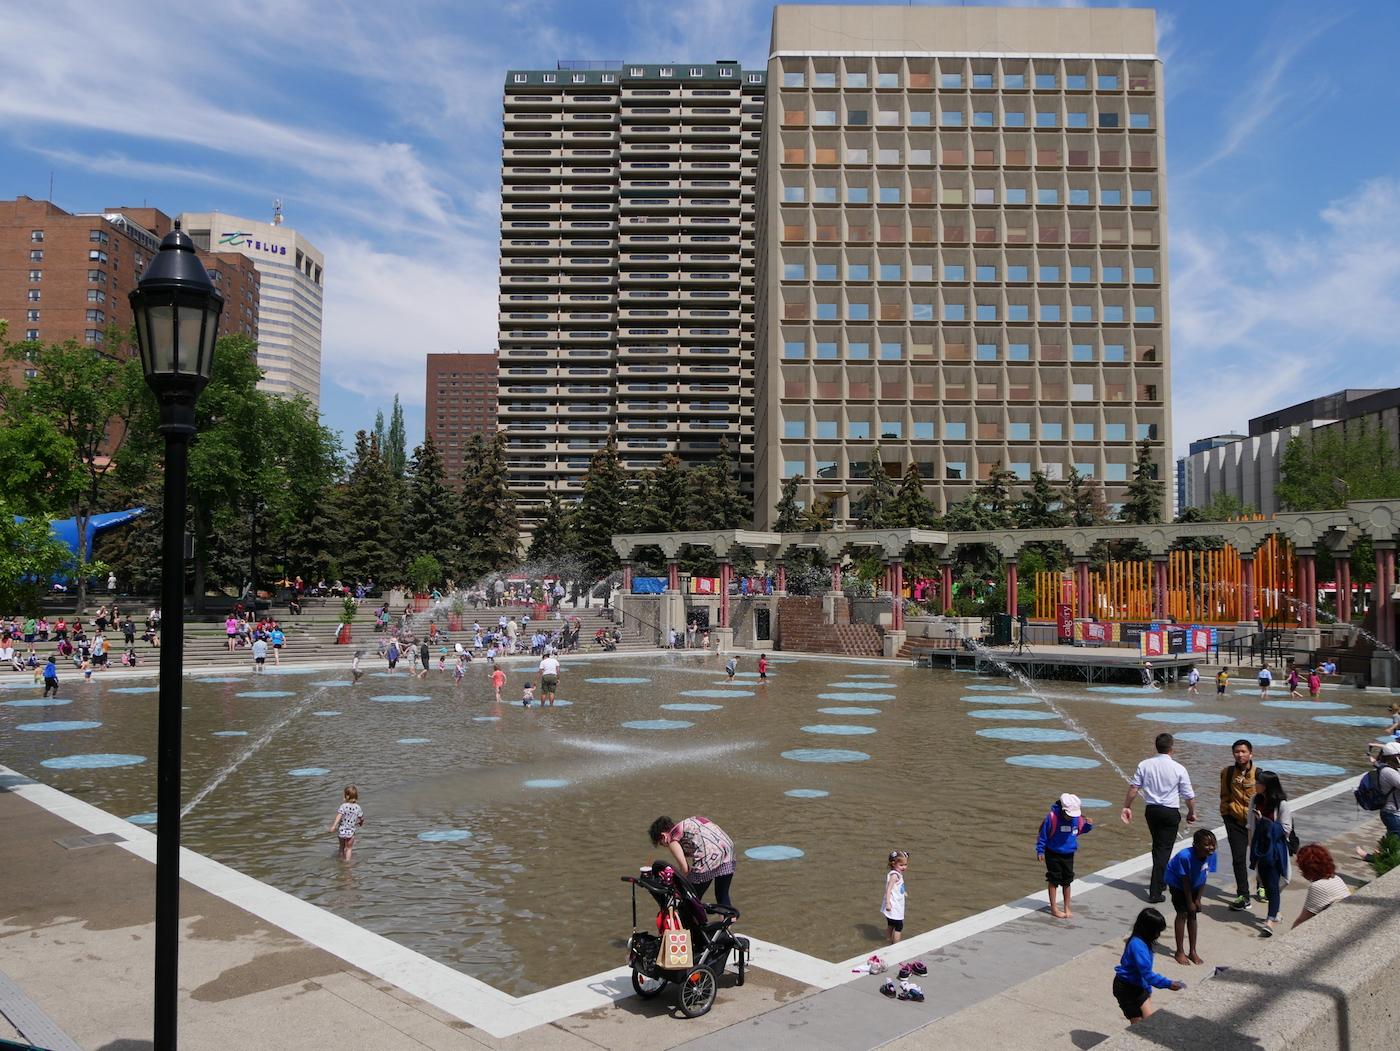 Olympic Plaza Calgary